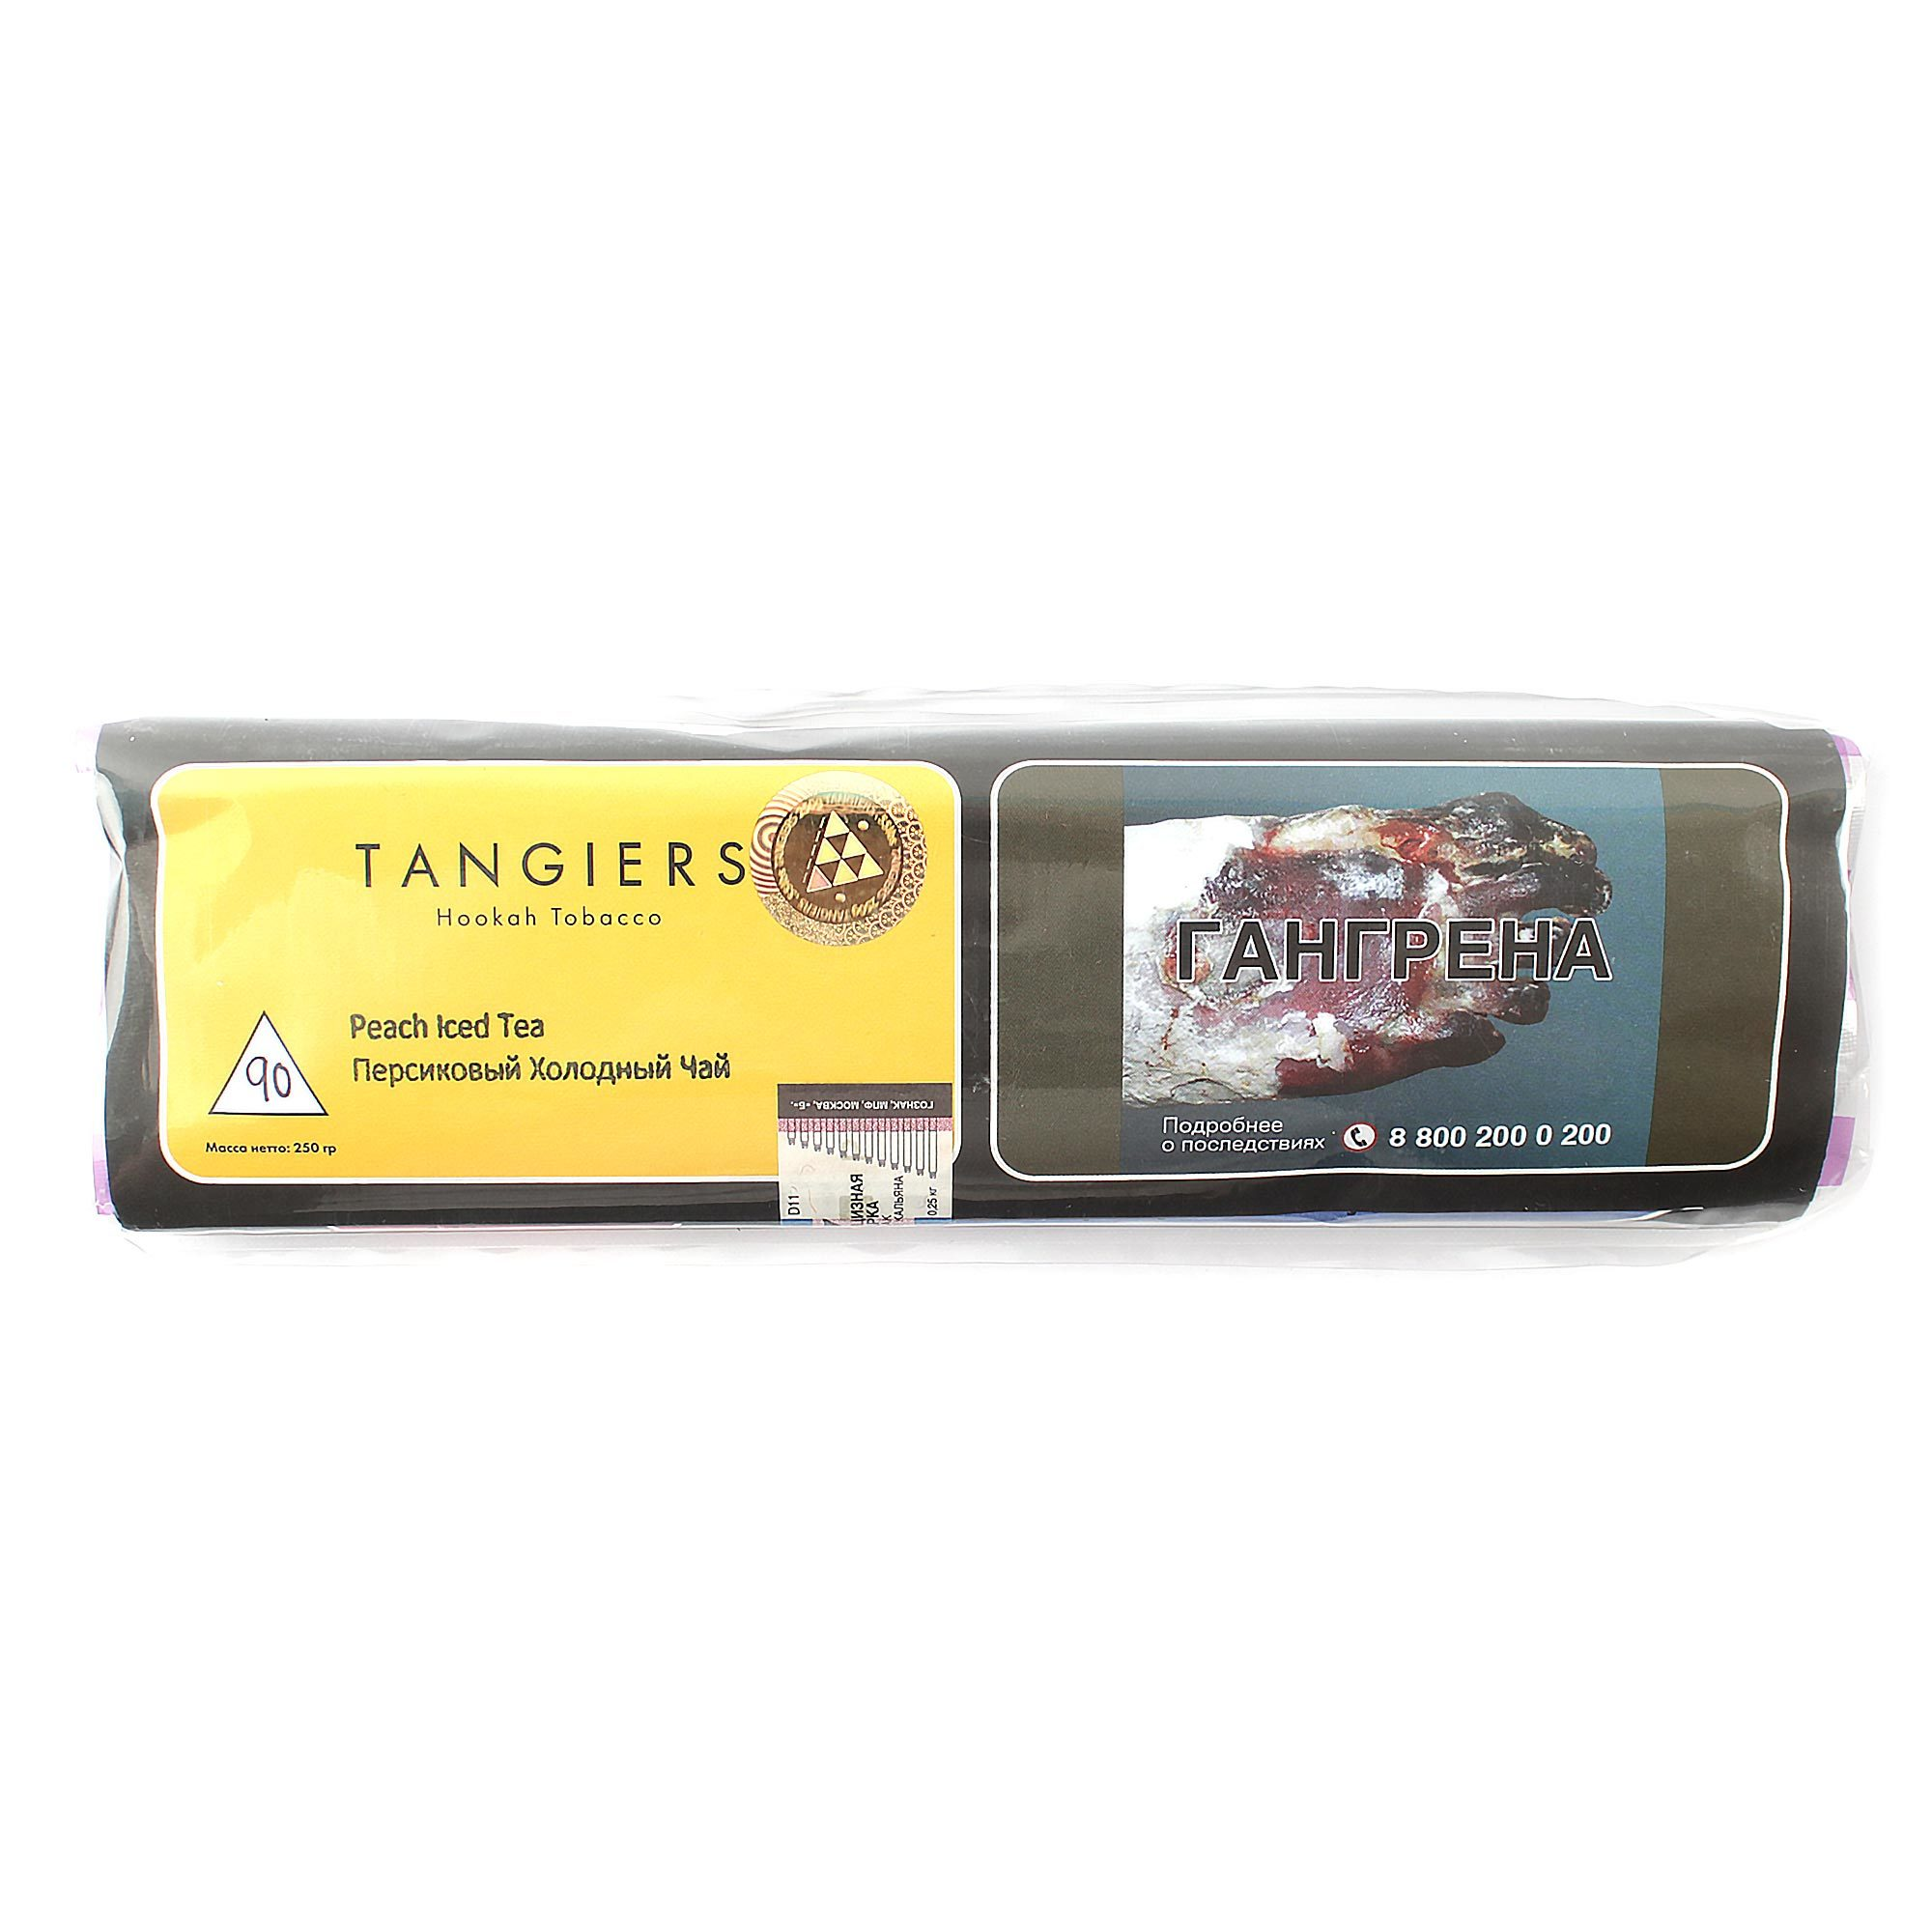 Табак для кальяна Tangiers Noir (желтый) 90 Peach Iced Tea